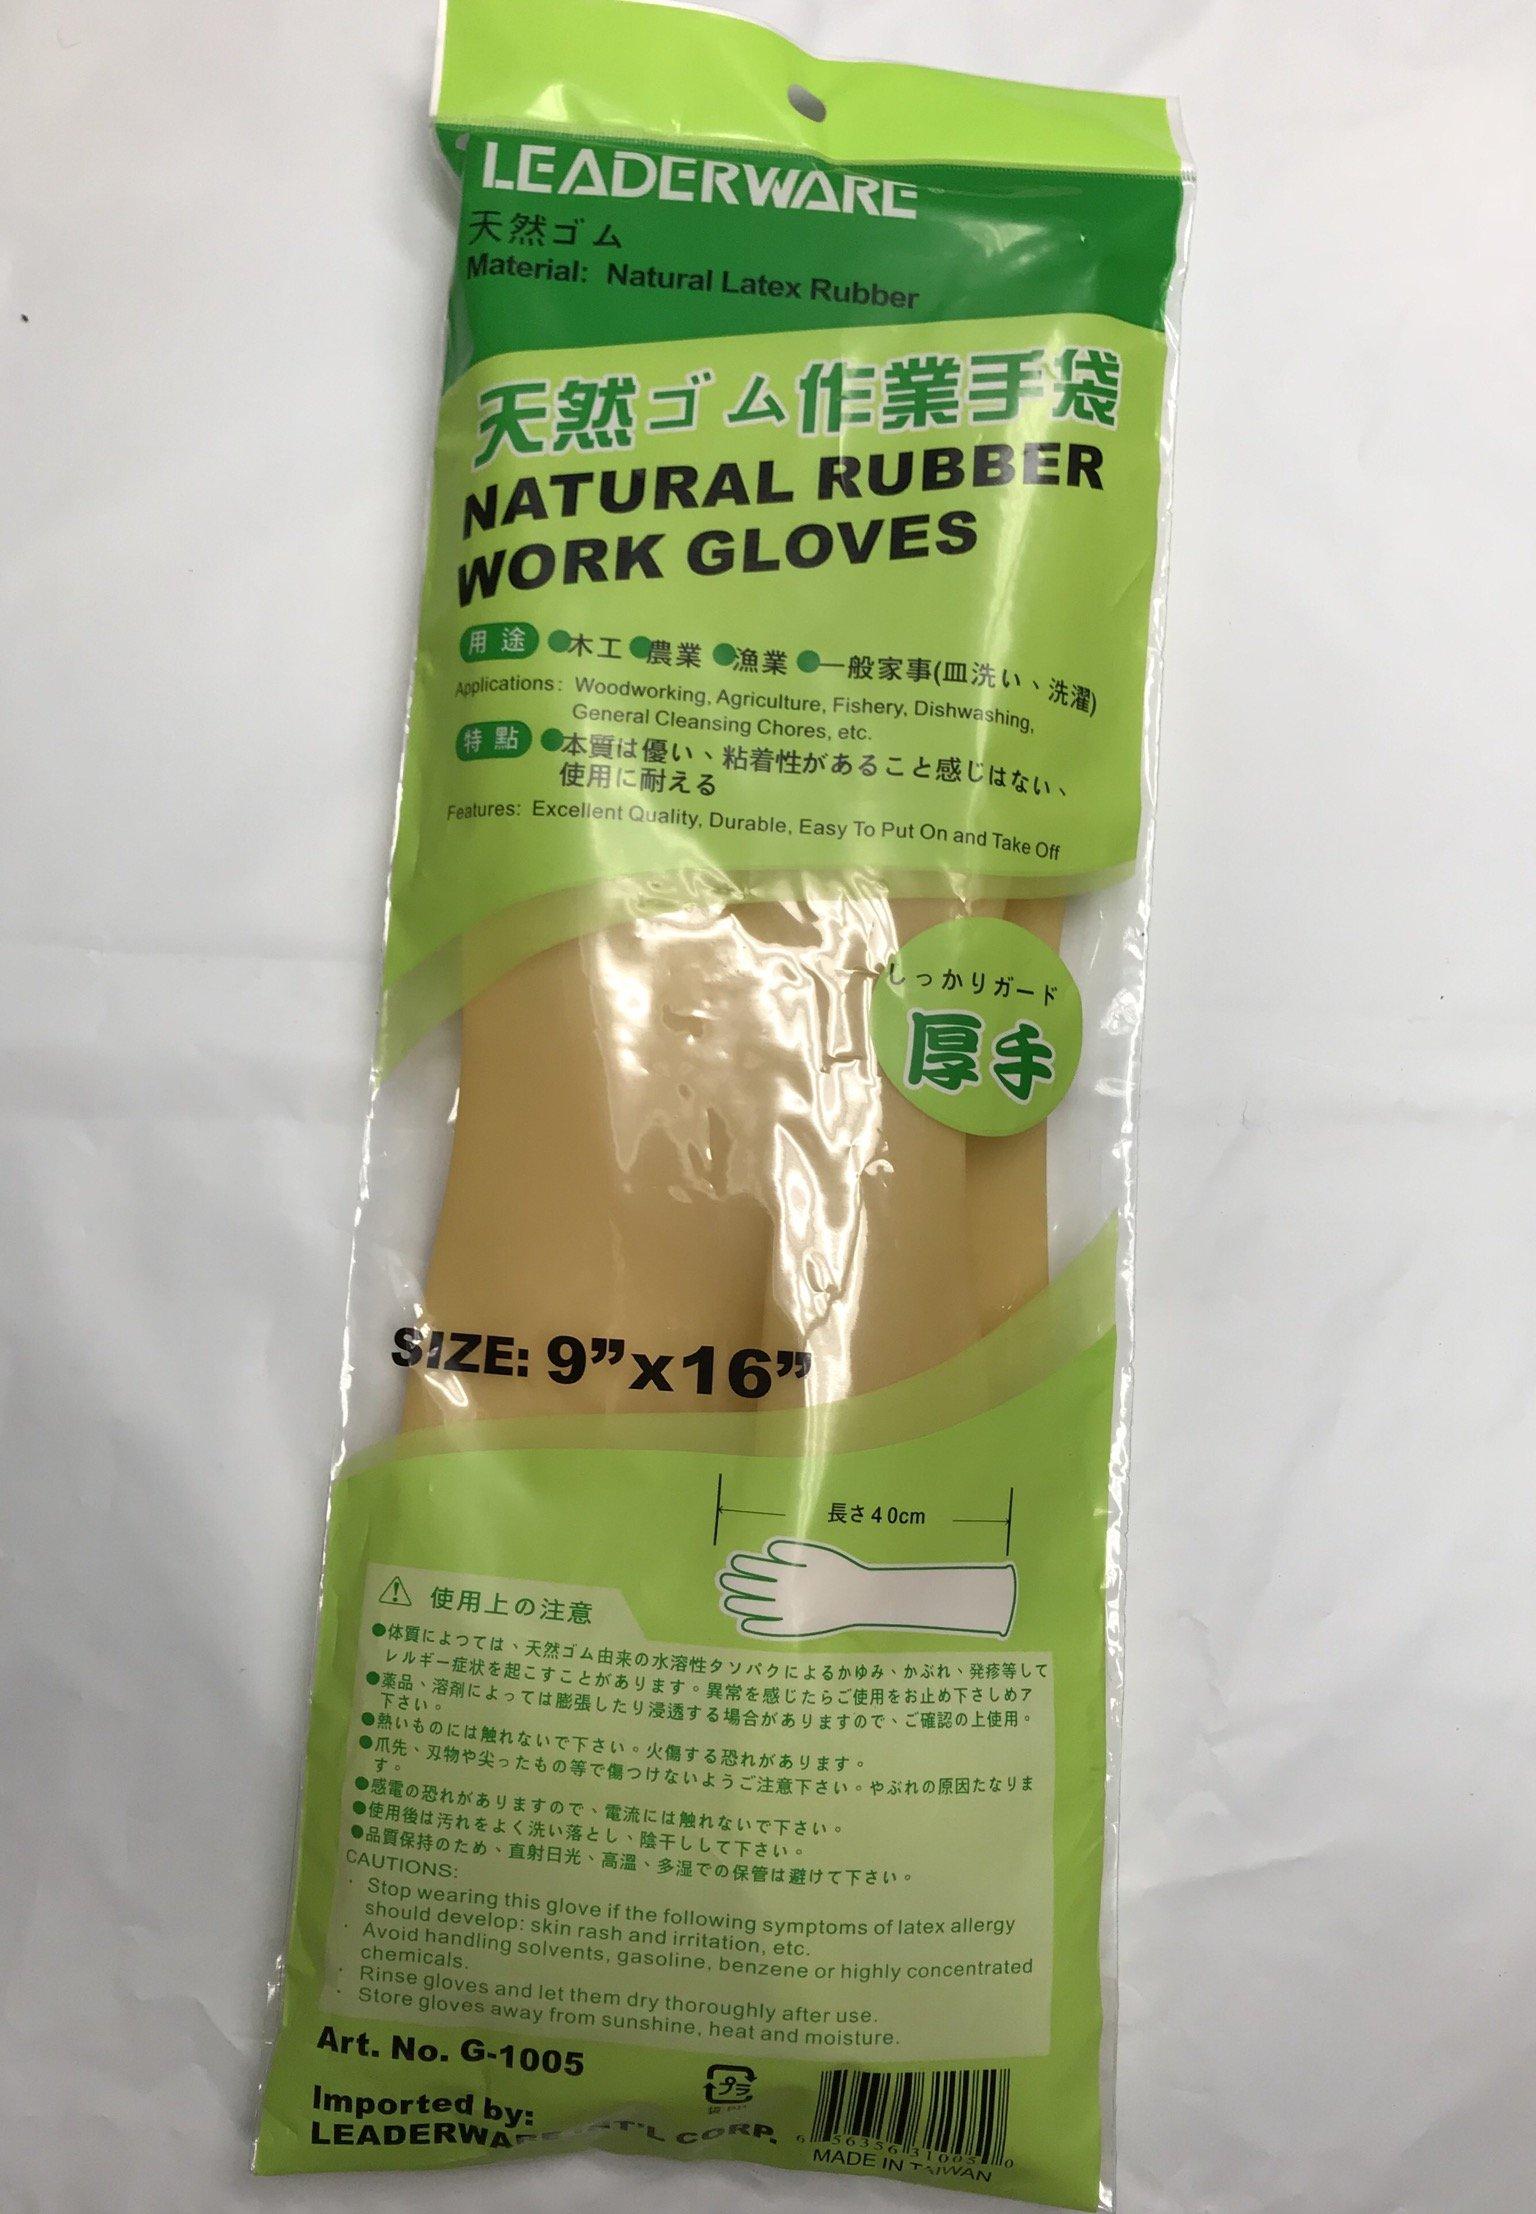 2 SET of Natural Latex Rubber Work Gloves 40cm/ 9''x16''( woodworking, dishwashing, kitchen)